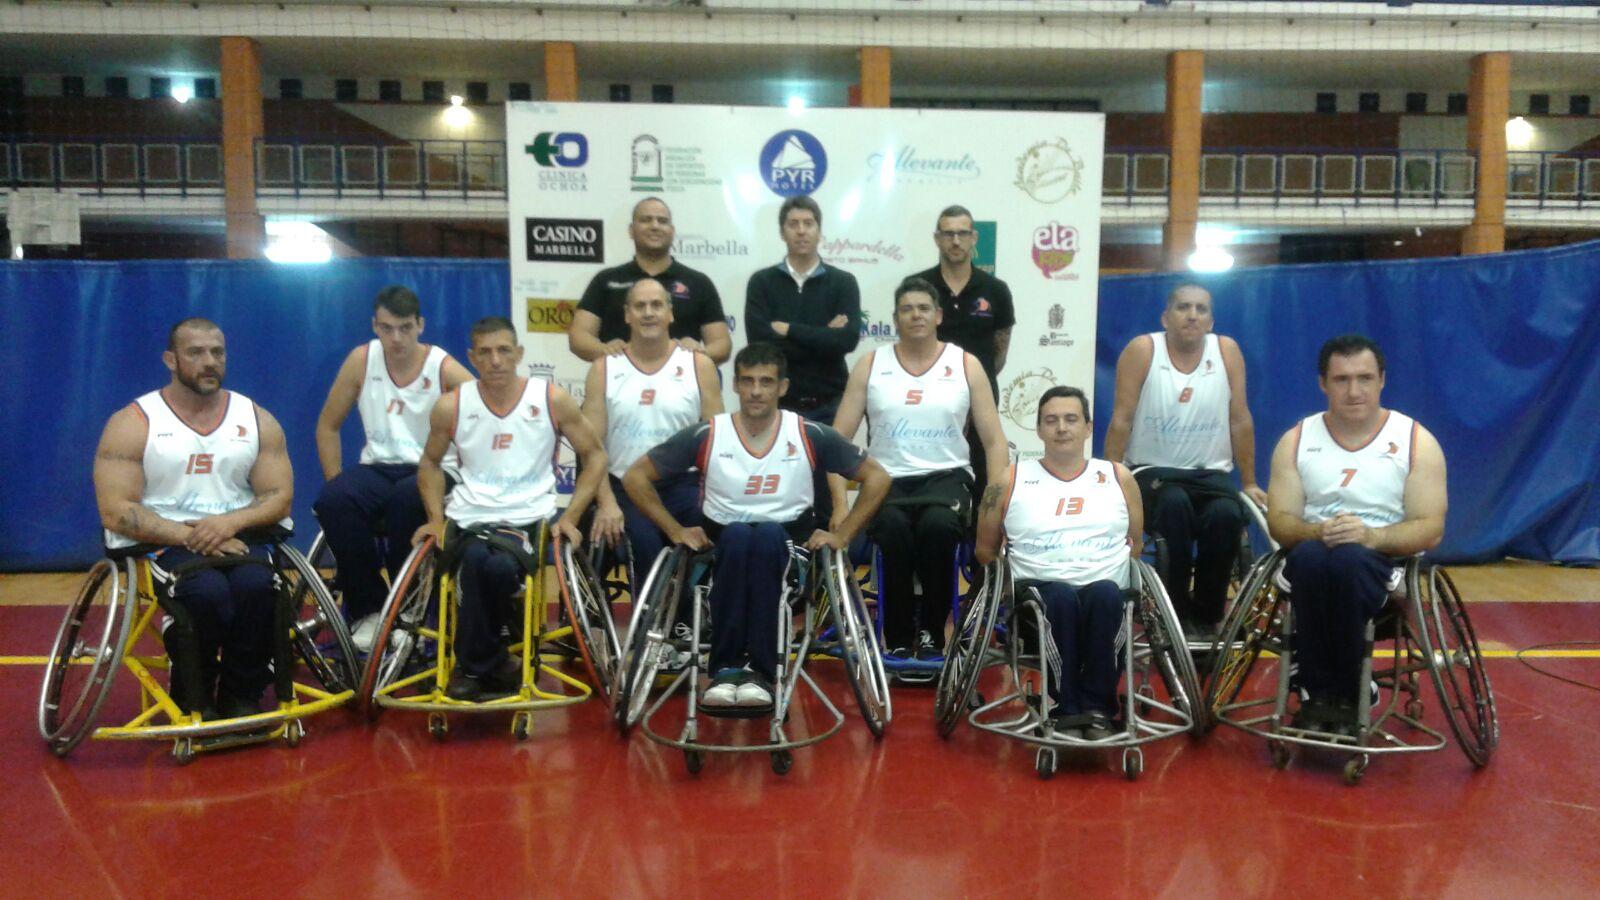 Beca sportuniverse baloncesto en silla de ruedas deportista entrenador - Baloncesto silla de ruedas ...